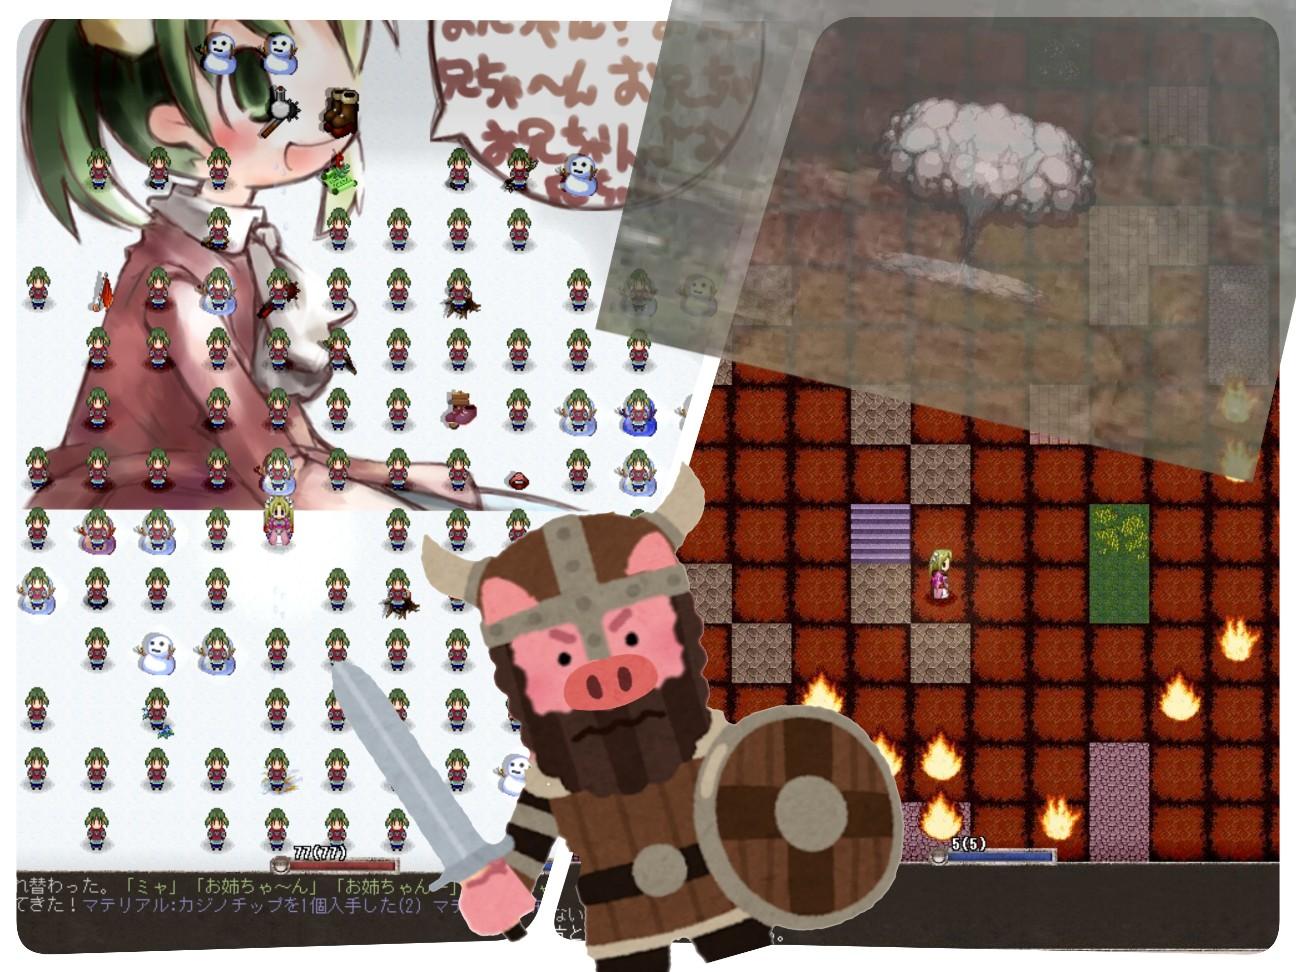 f:id:mouse_314:20210110233112j:plain